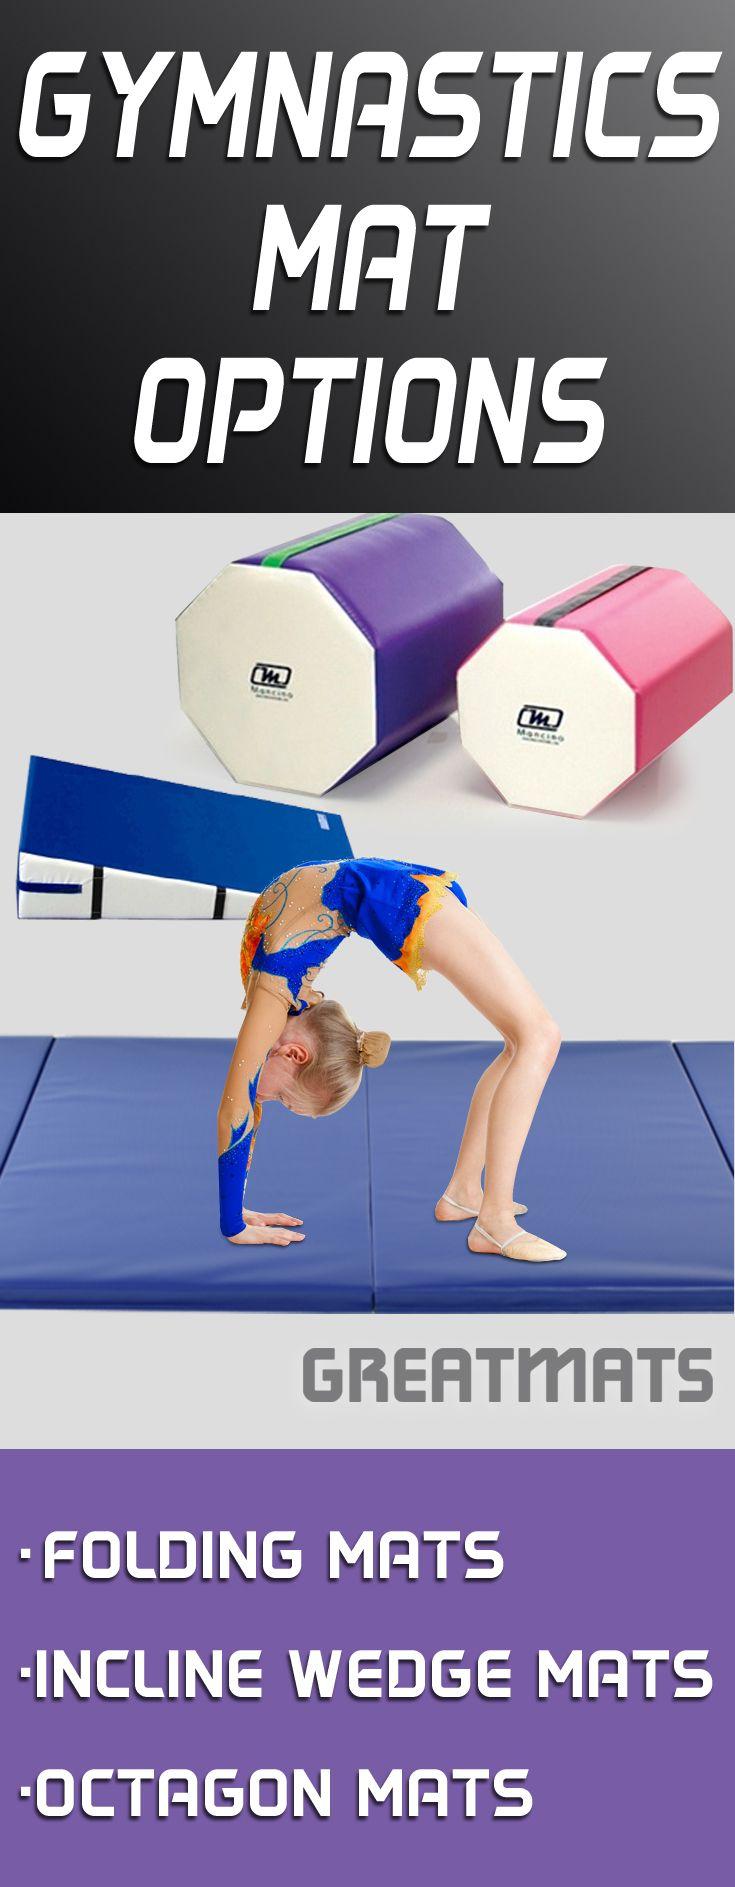 26 Best Images About Gymnastics Mats On Pinterest